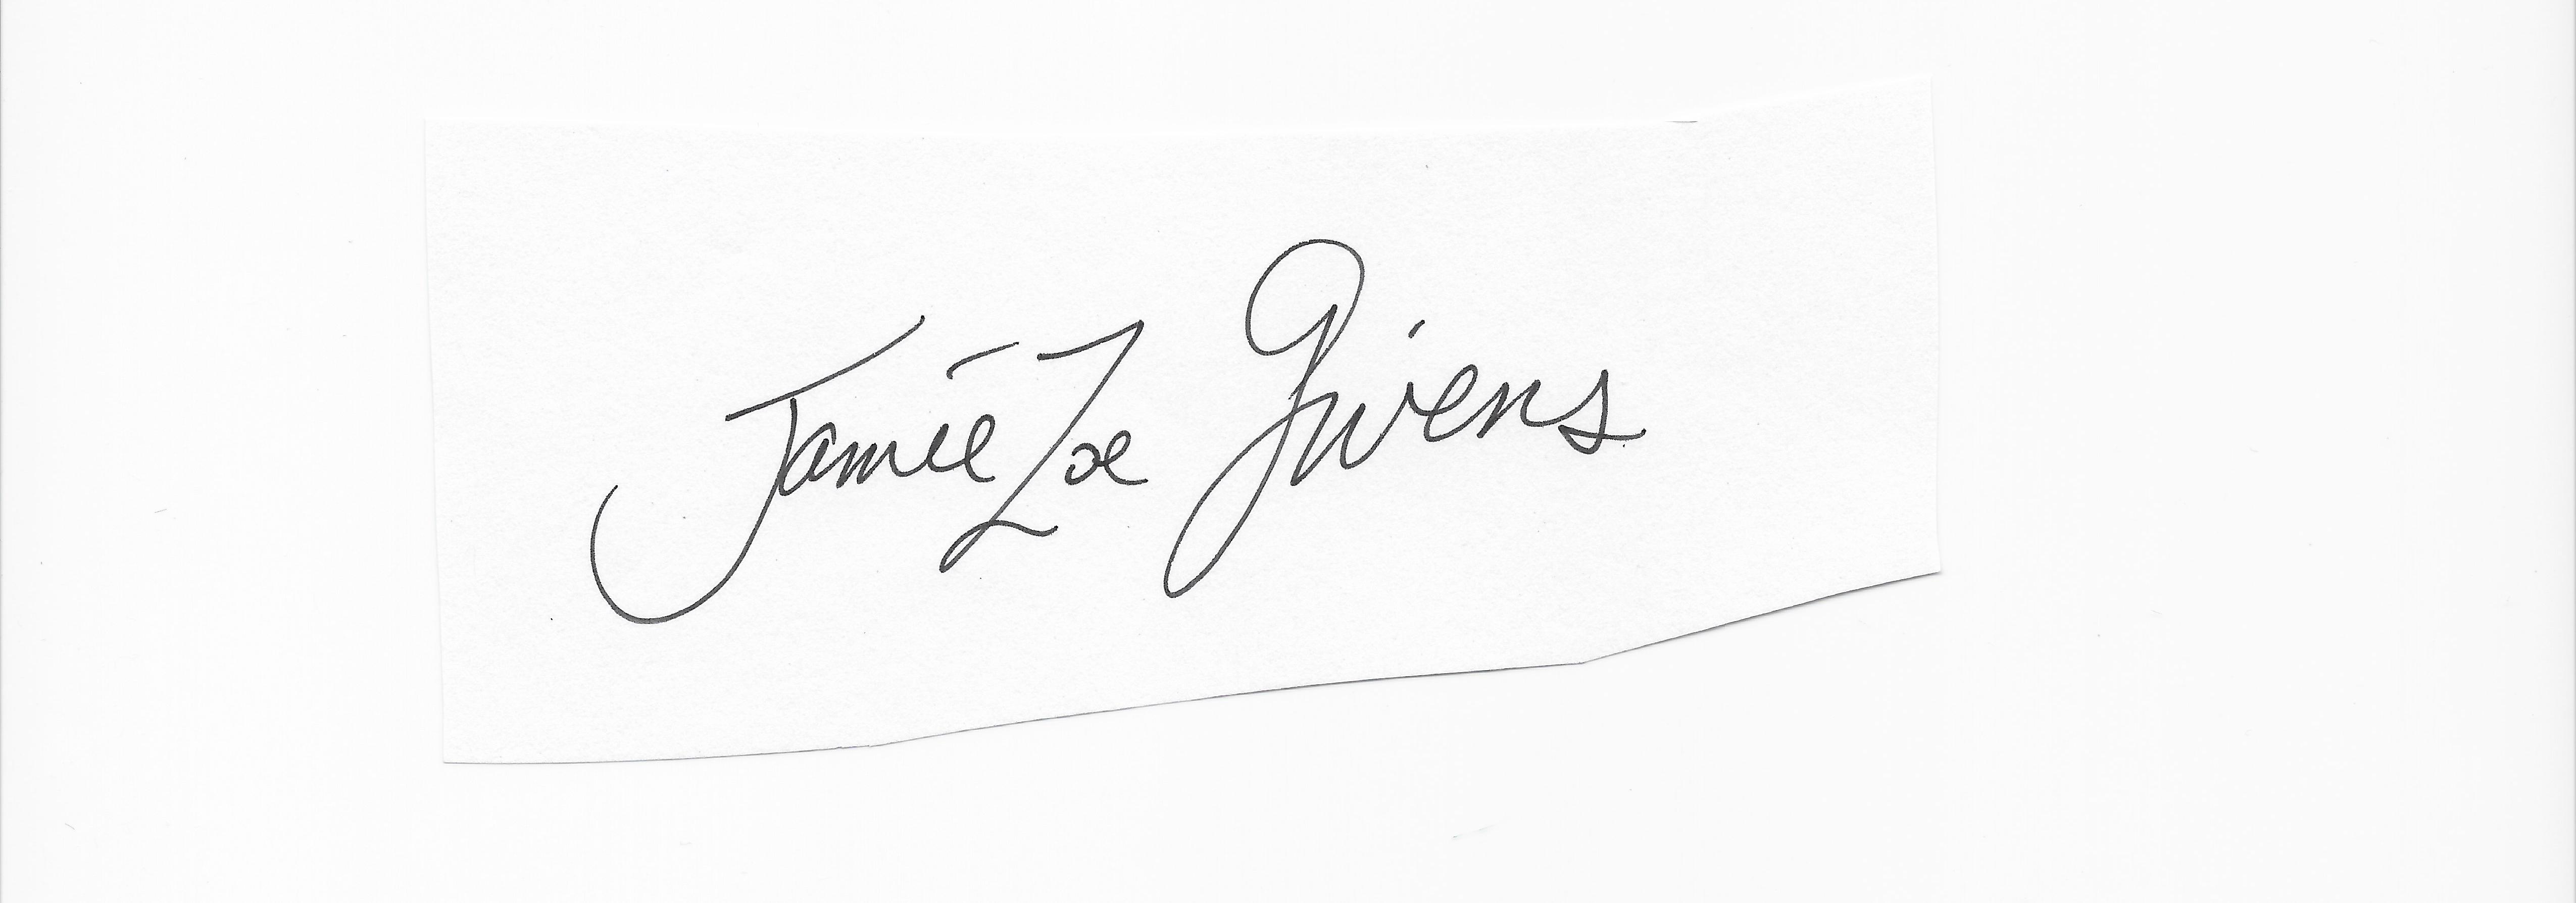 jamie Zoe givens's Signature